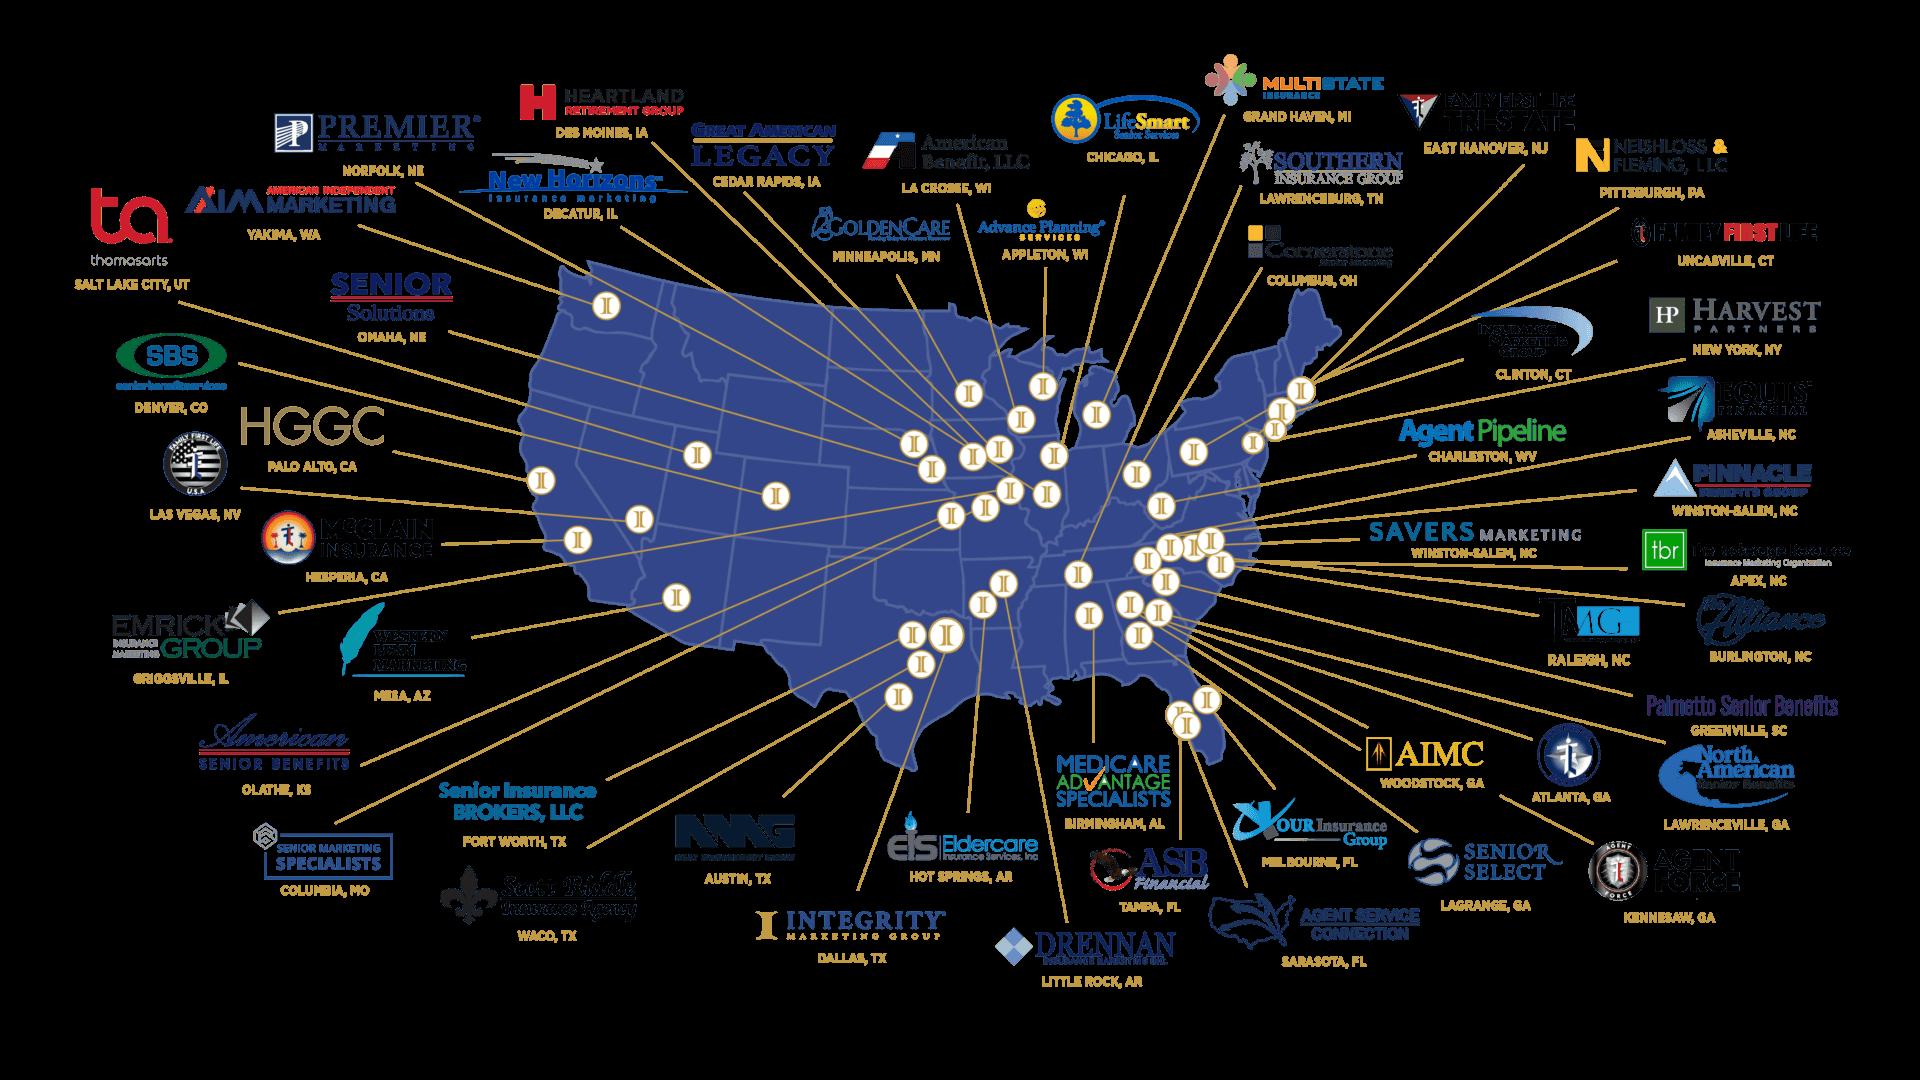 Integrity Marketing Companies Map